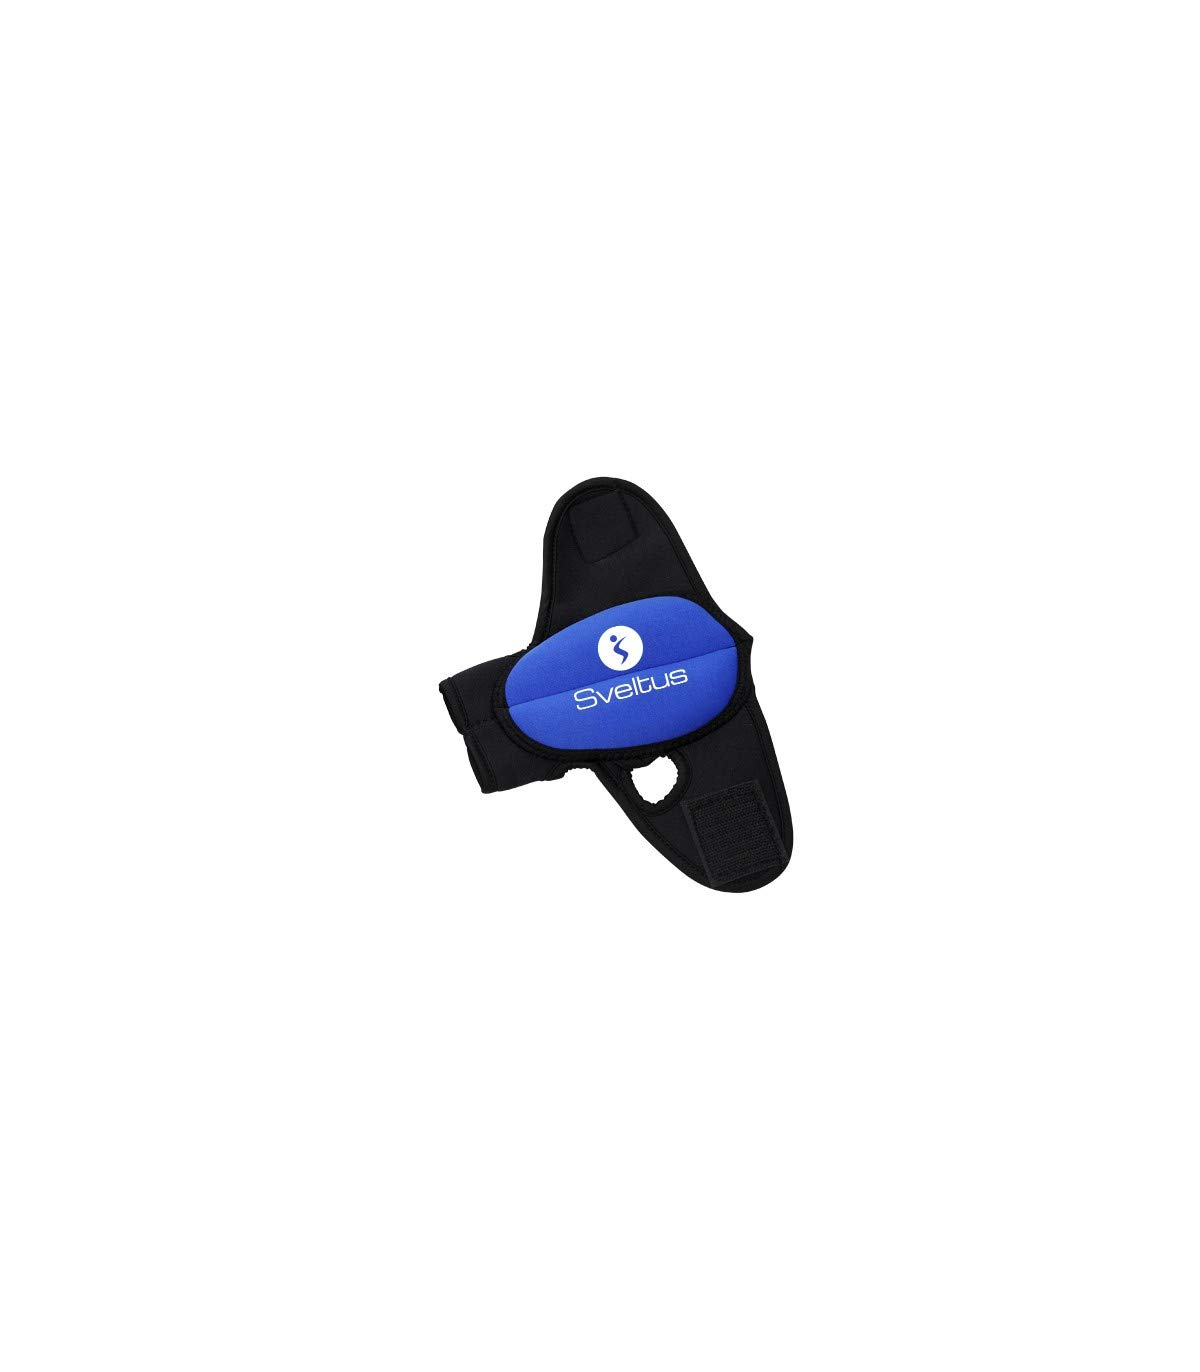 sveltus 0972 Handschuhe zum Fahren Unisex Blau Erwachsene